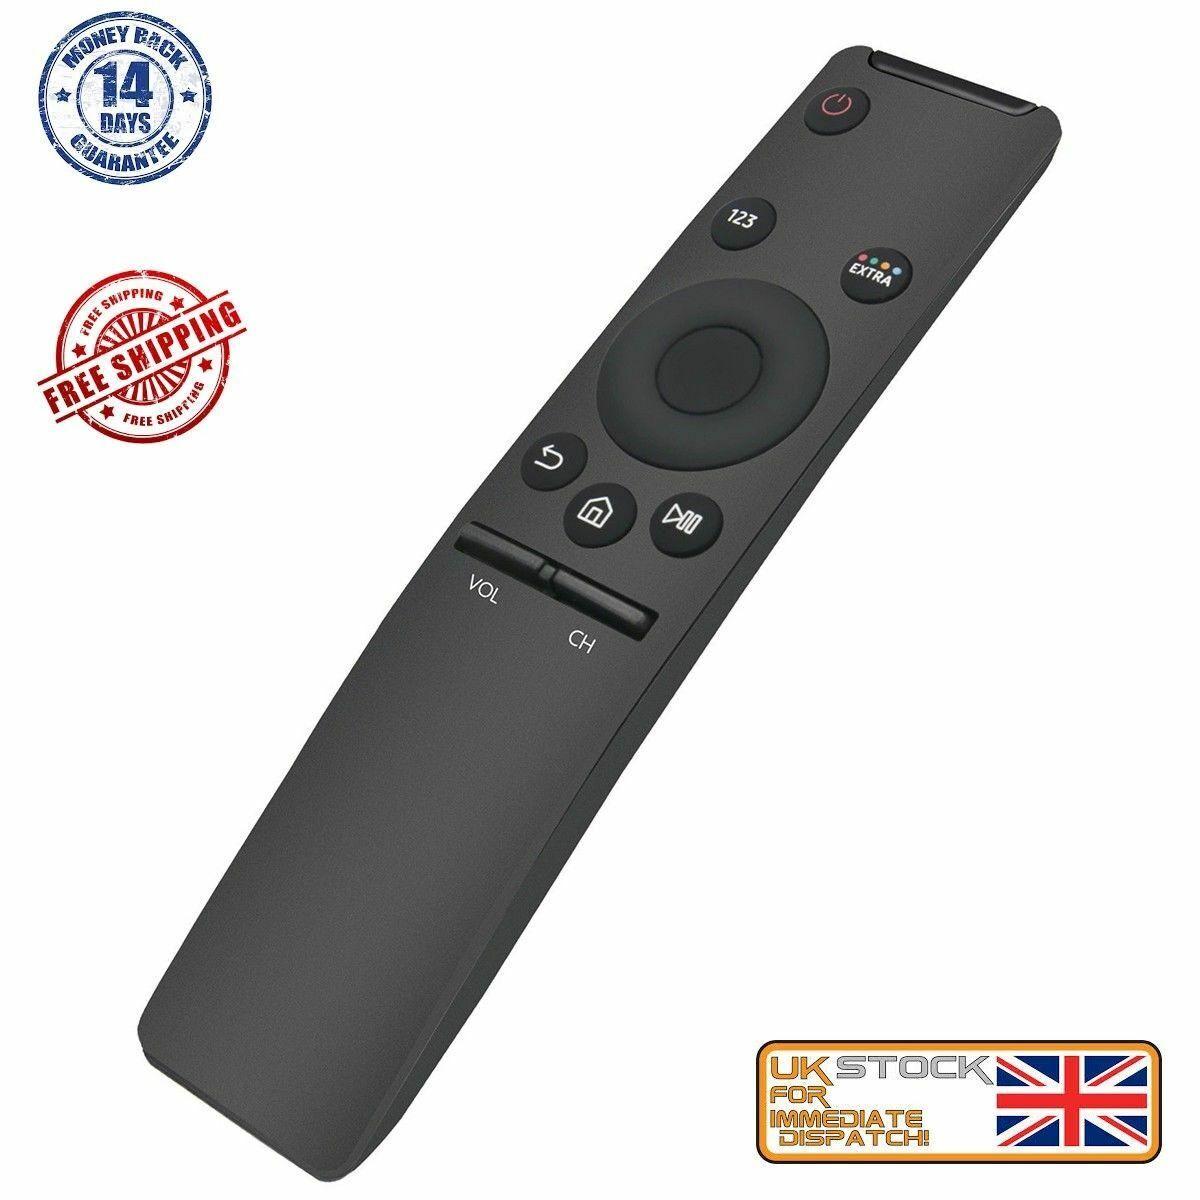 TV Remote for Samsung 4K Smart TV Model UE43KU6405UXXE UE43KU6405